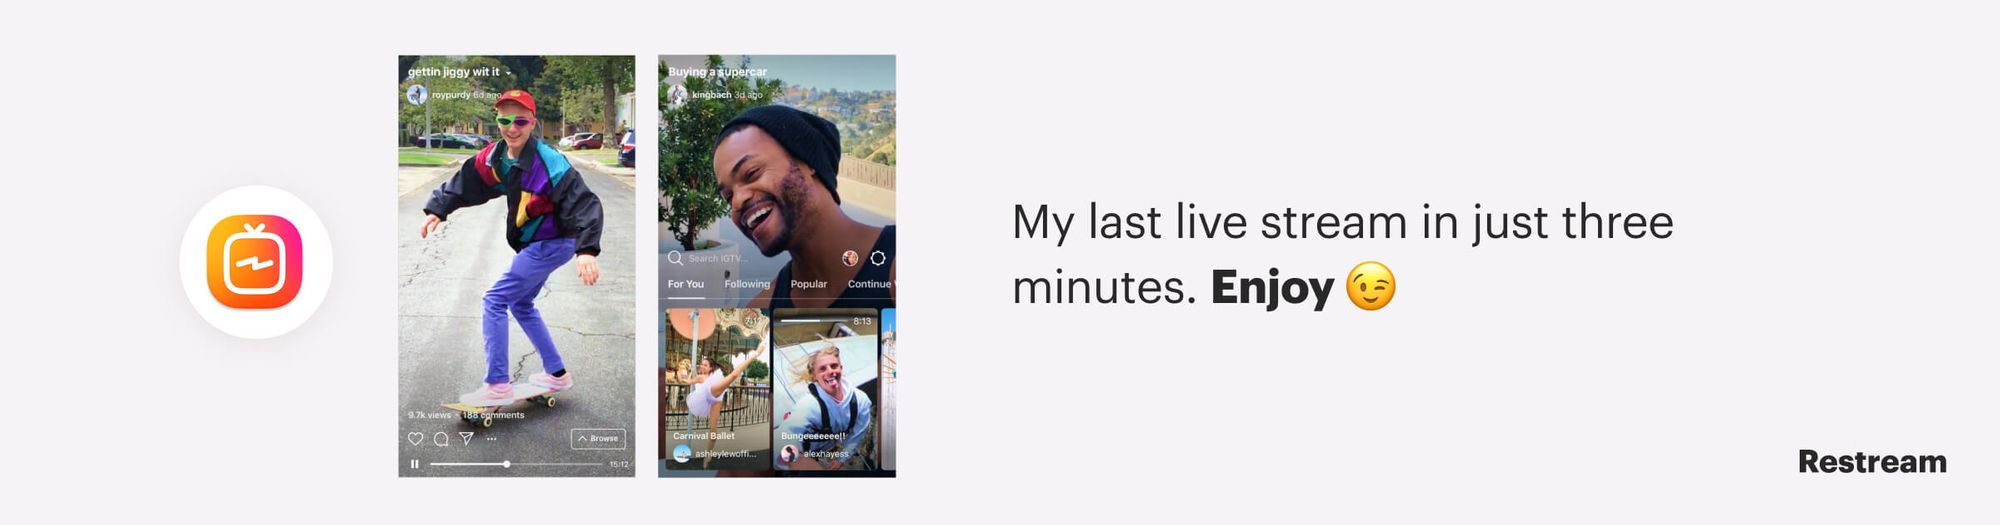 Way to repurpose your content – Instagram teaser